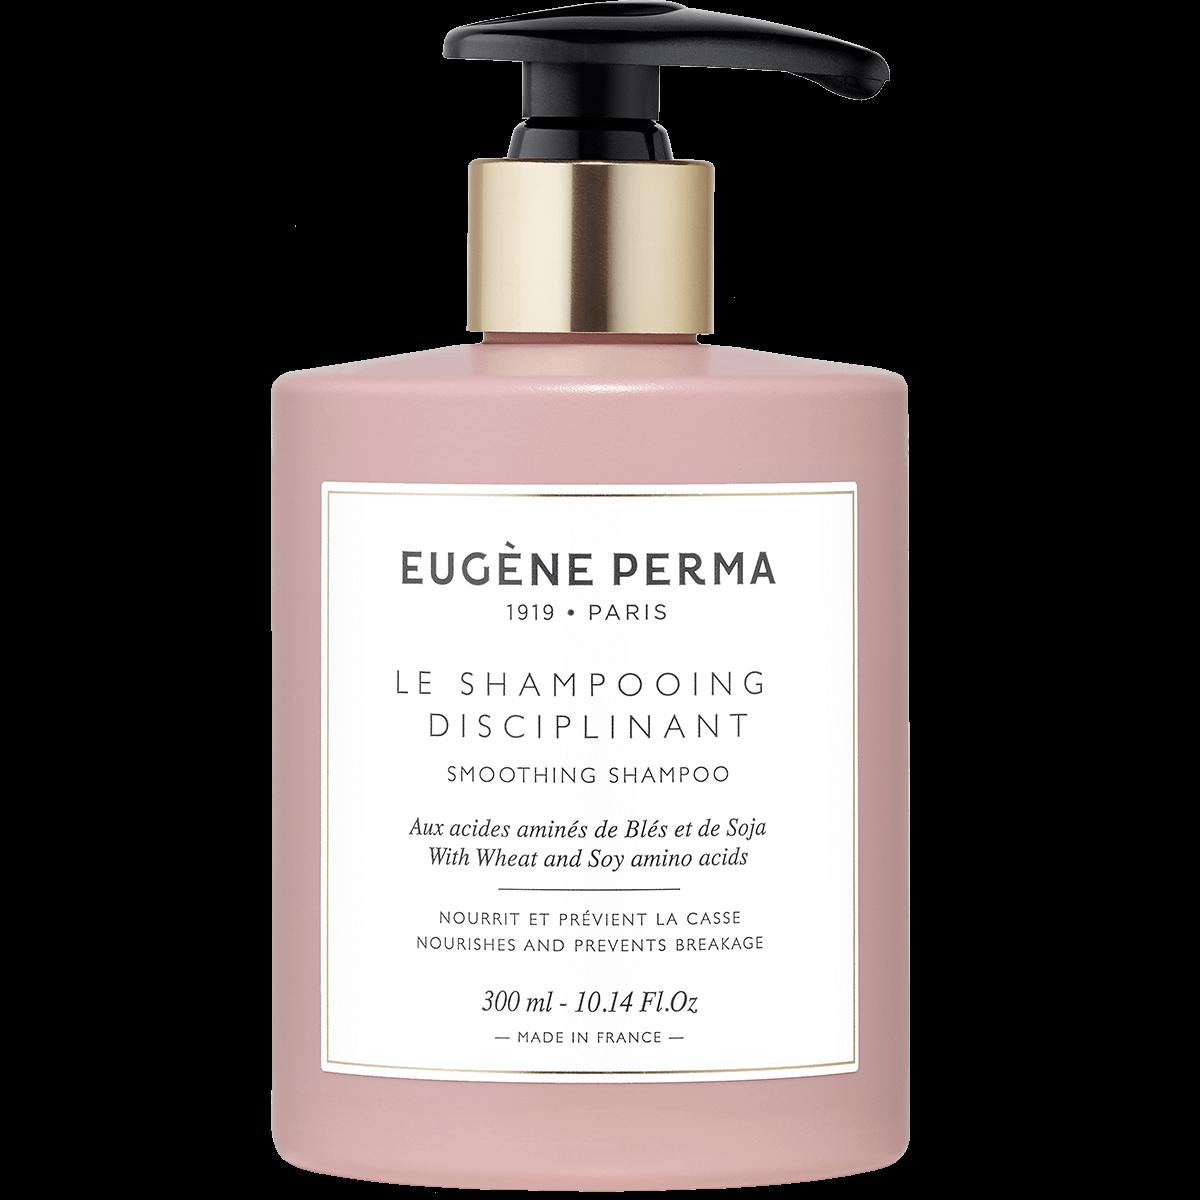 eugeneperma-1919-shampooing-disciplinant-1200x1200